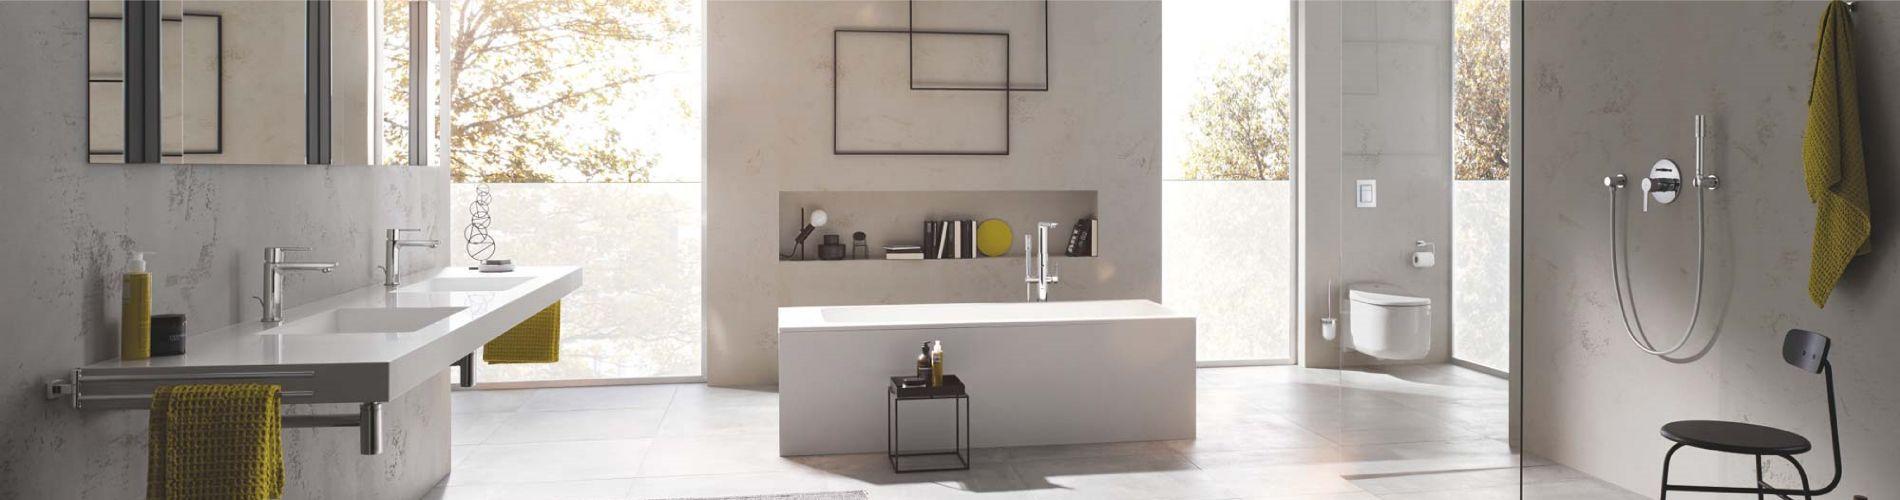 www moebel hausmann de simple vintage de sede dsp. Black Bedroom Furniture Sets. Home Design Ideas